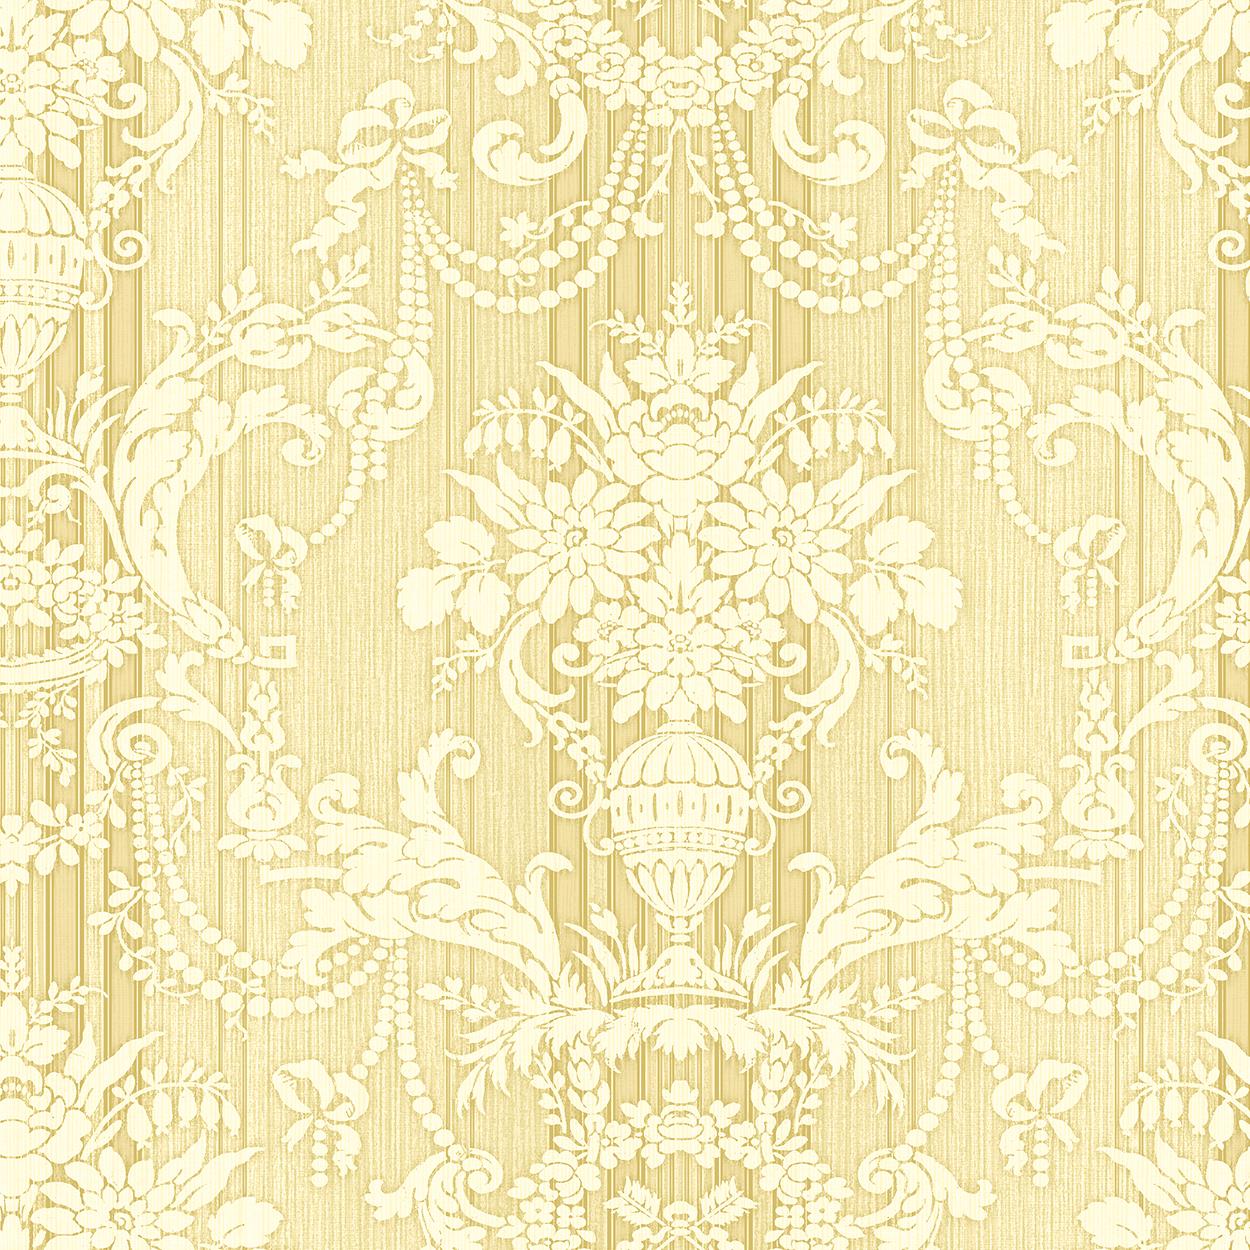 کاغذ دیواری گل داماسک طلایی از آلبوم لاکچری داماسک فولیو برند سیبروک کد 30801 آمریکا